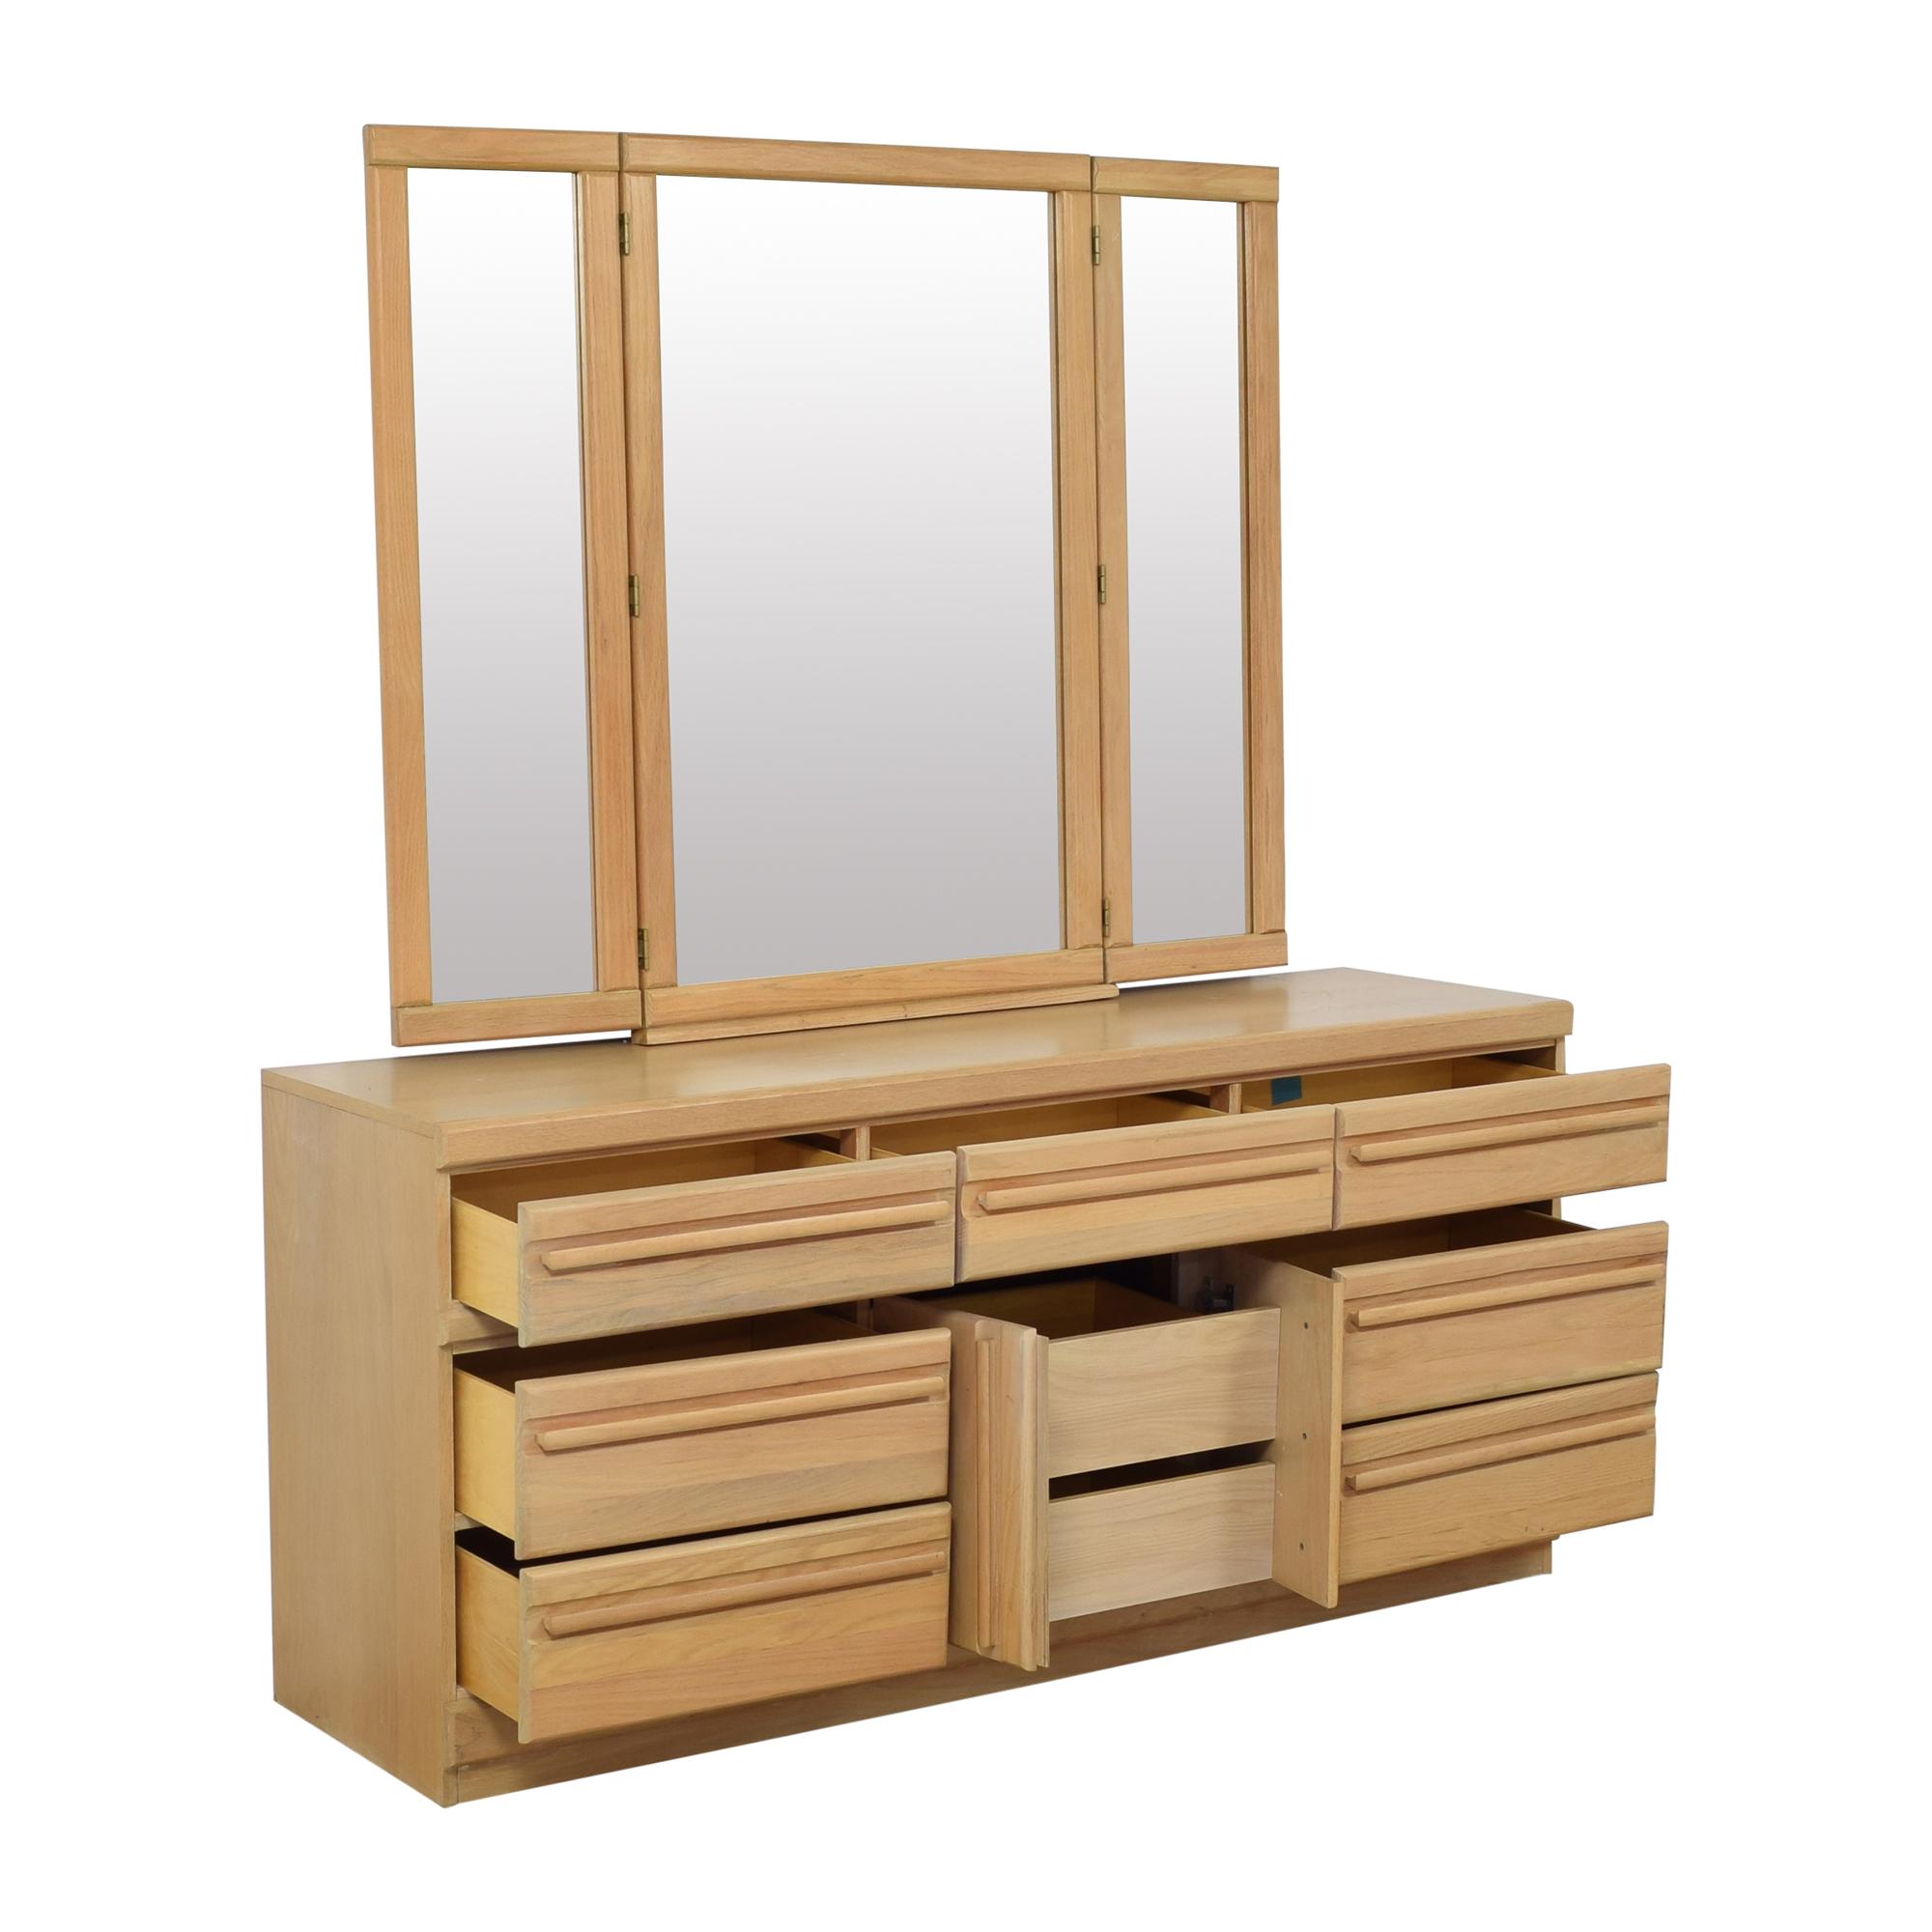 Broyhill Furniture Broyhill Triple Dresser with Mirror nyc